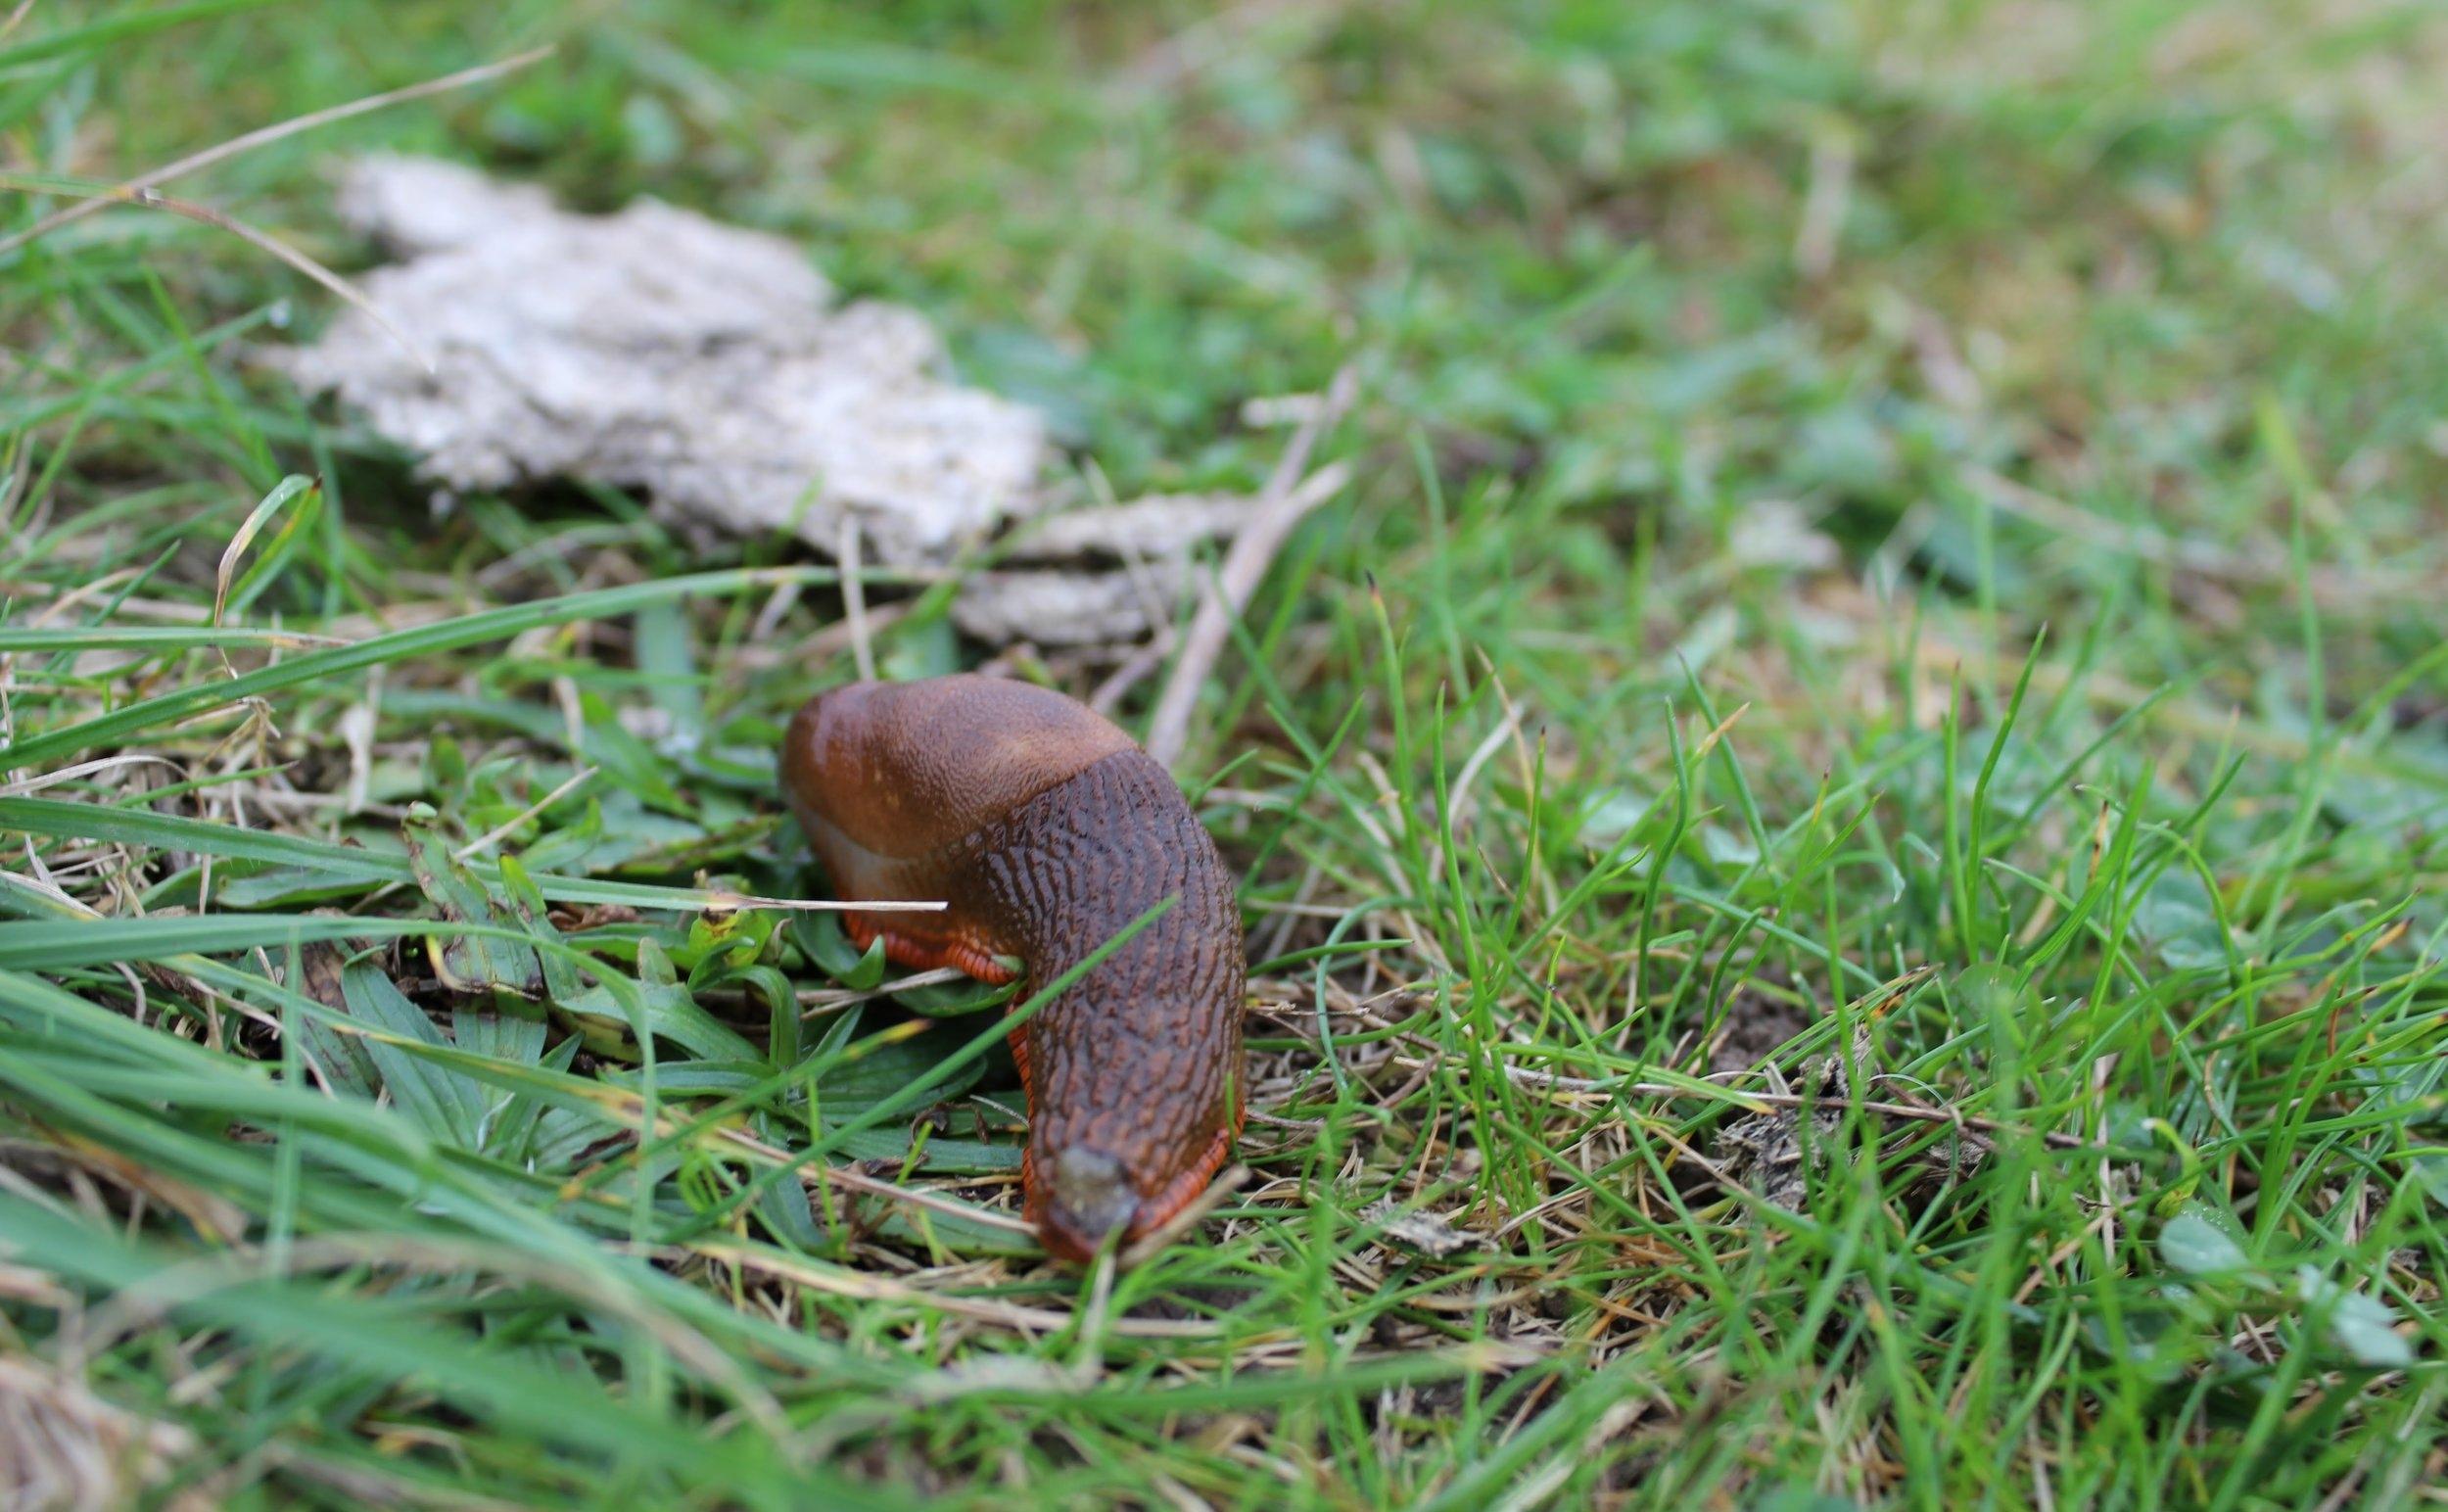 Slug at Stonehenge